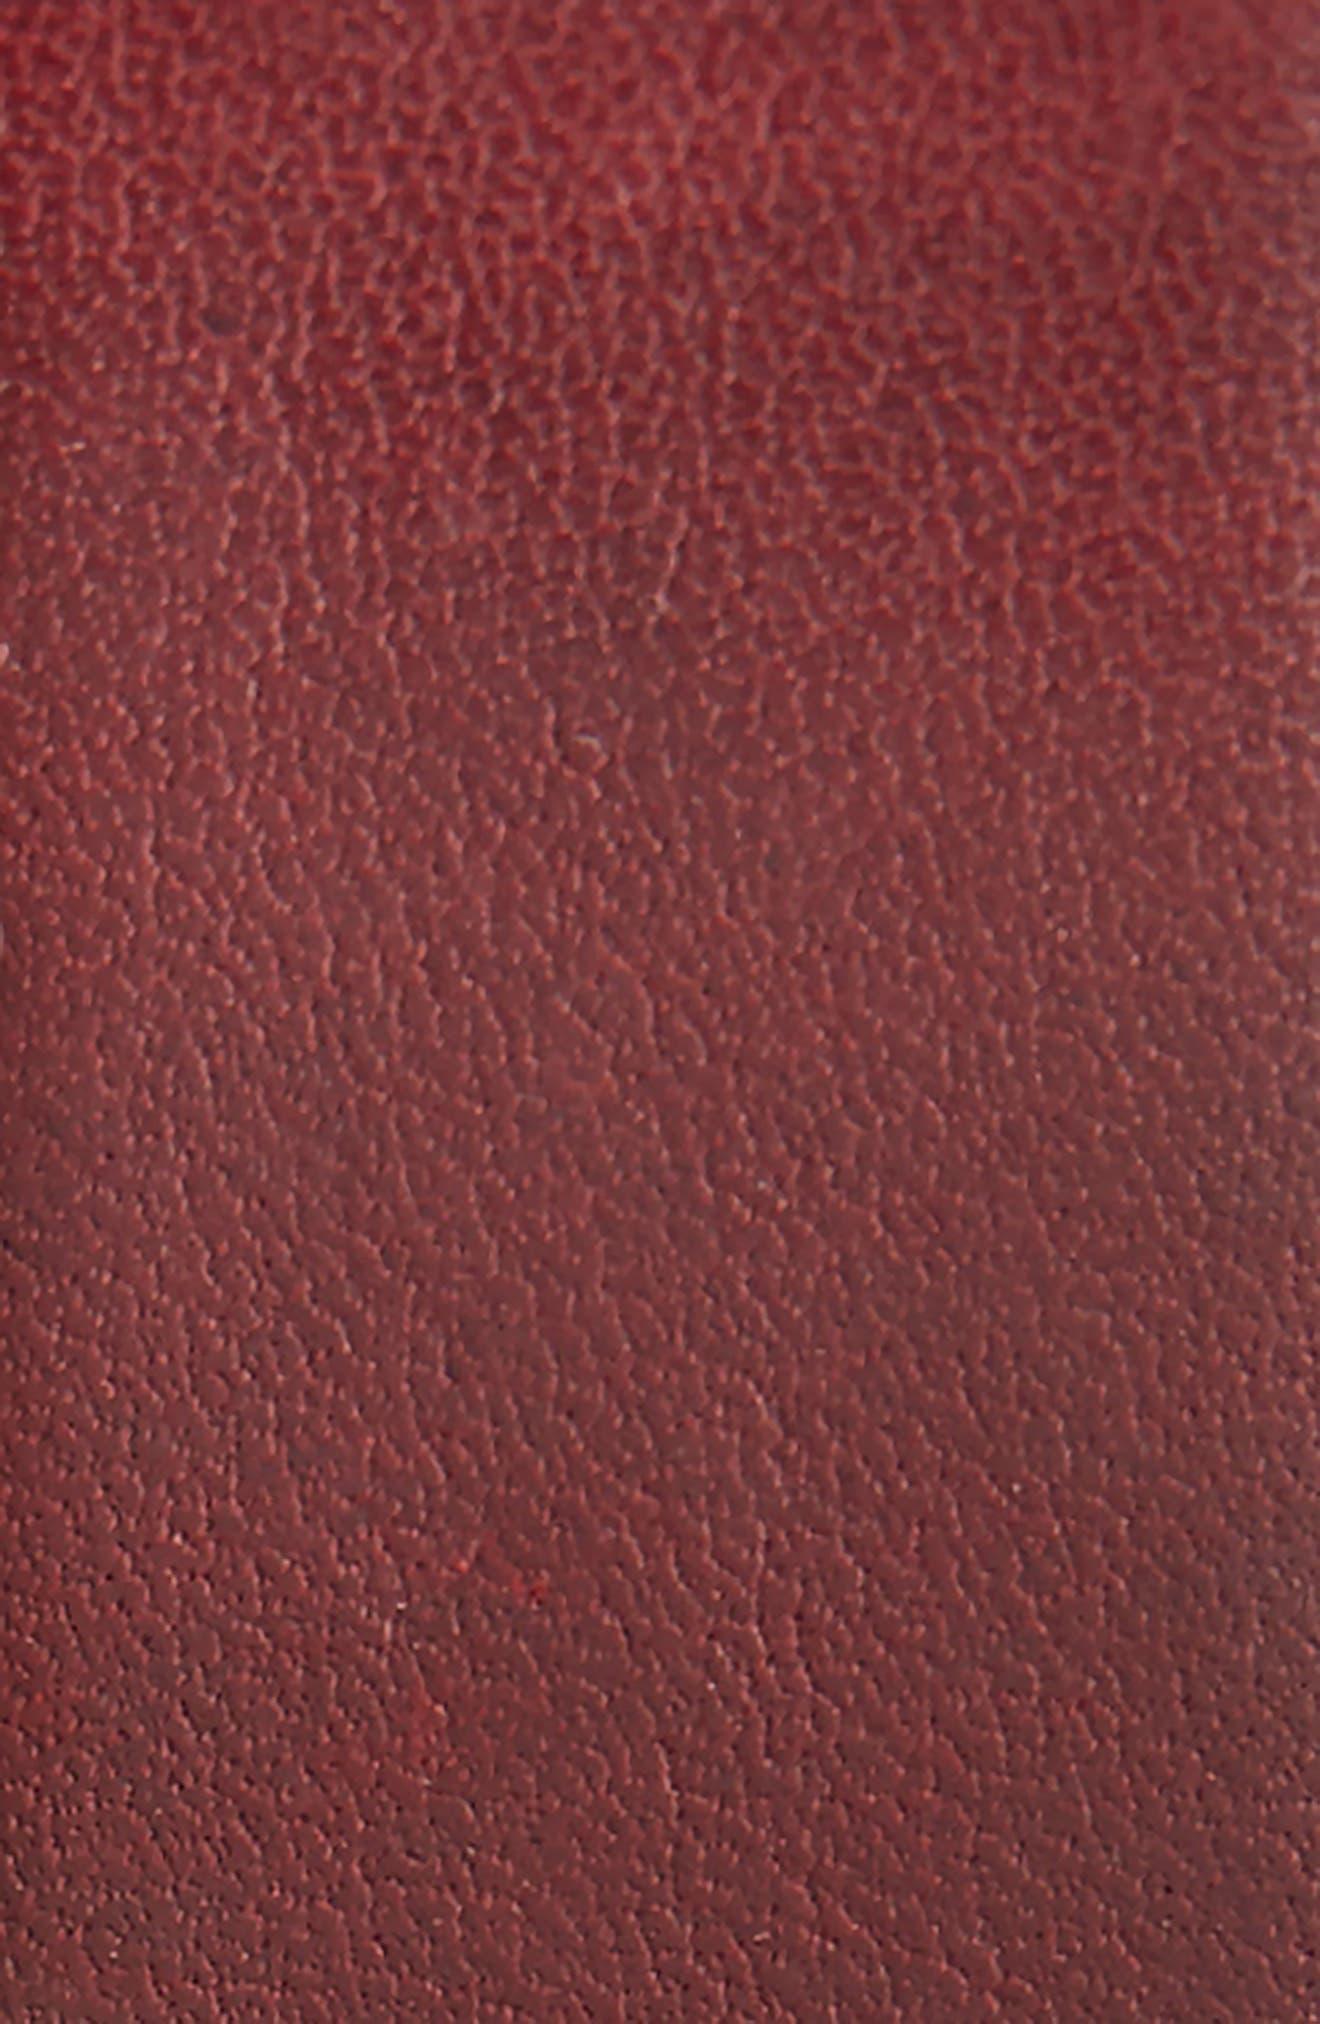 Burnished Brogue Leather Belt,                             Alternate thumbnail 2, color,                             RED